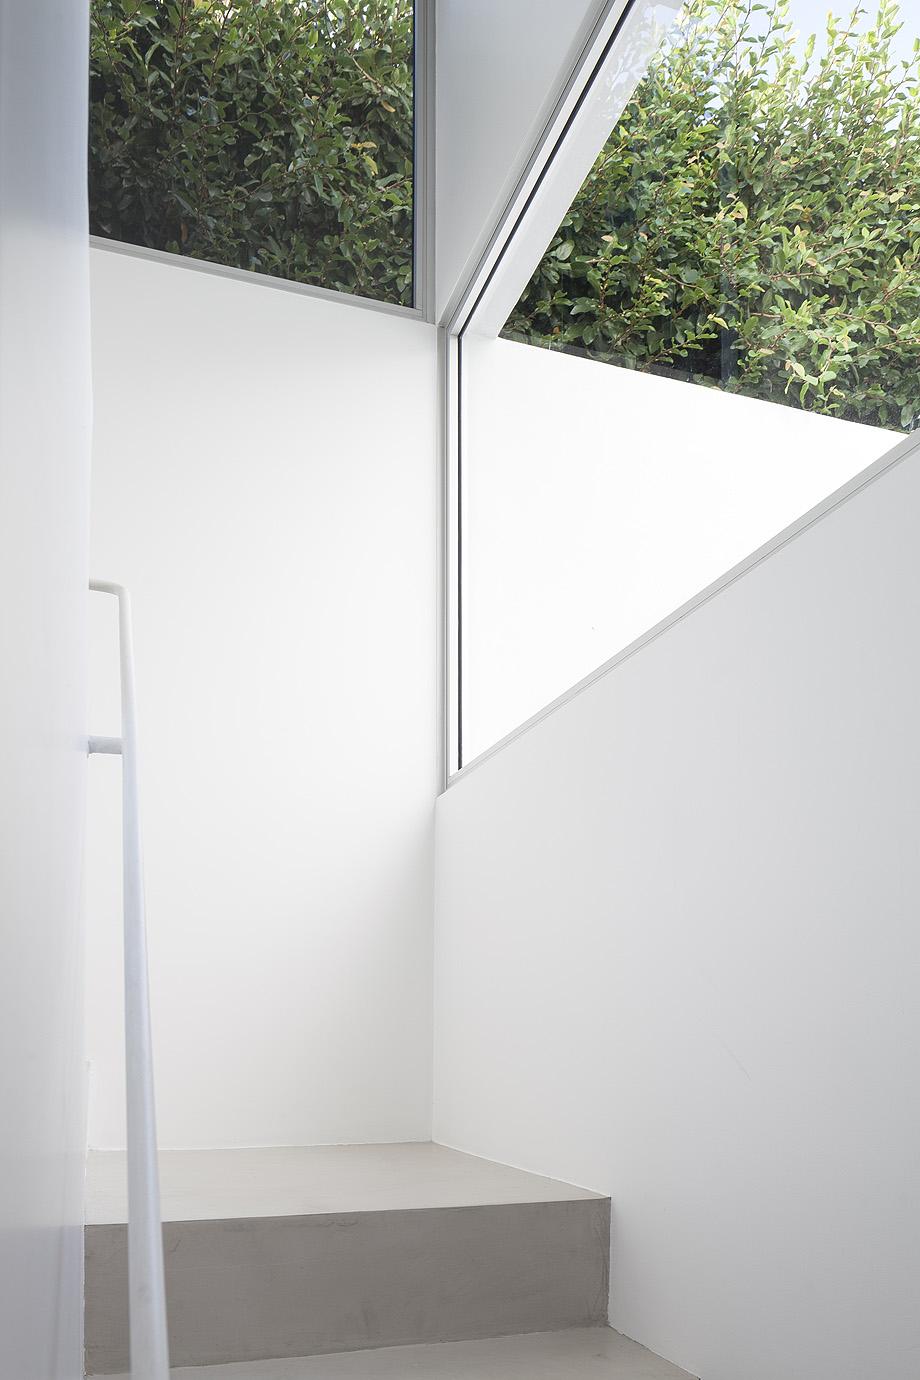 reforma vivienda ph thames por alonso & crippa - foto javier agustin rojas (11)